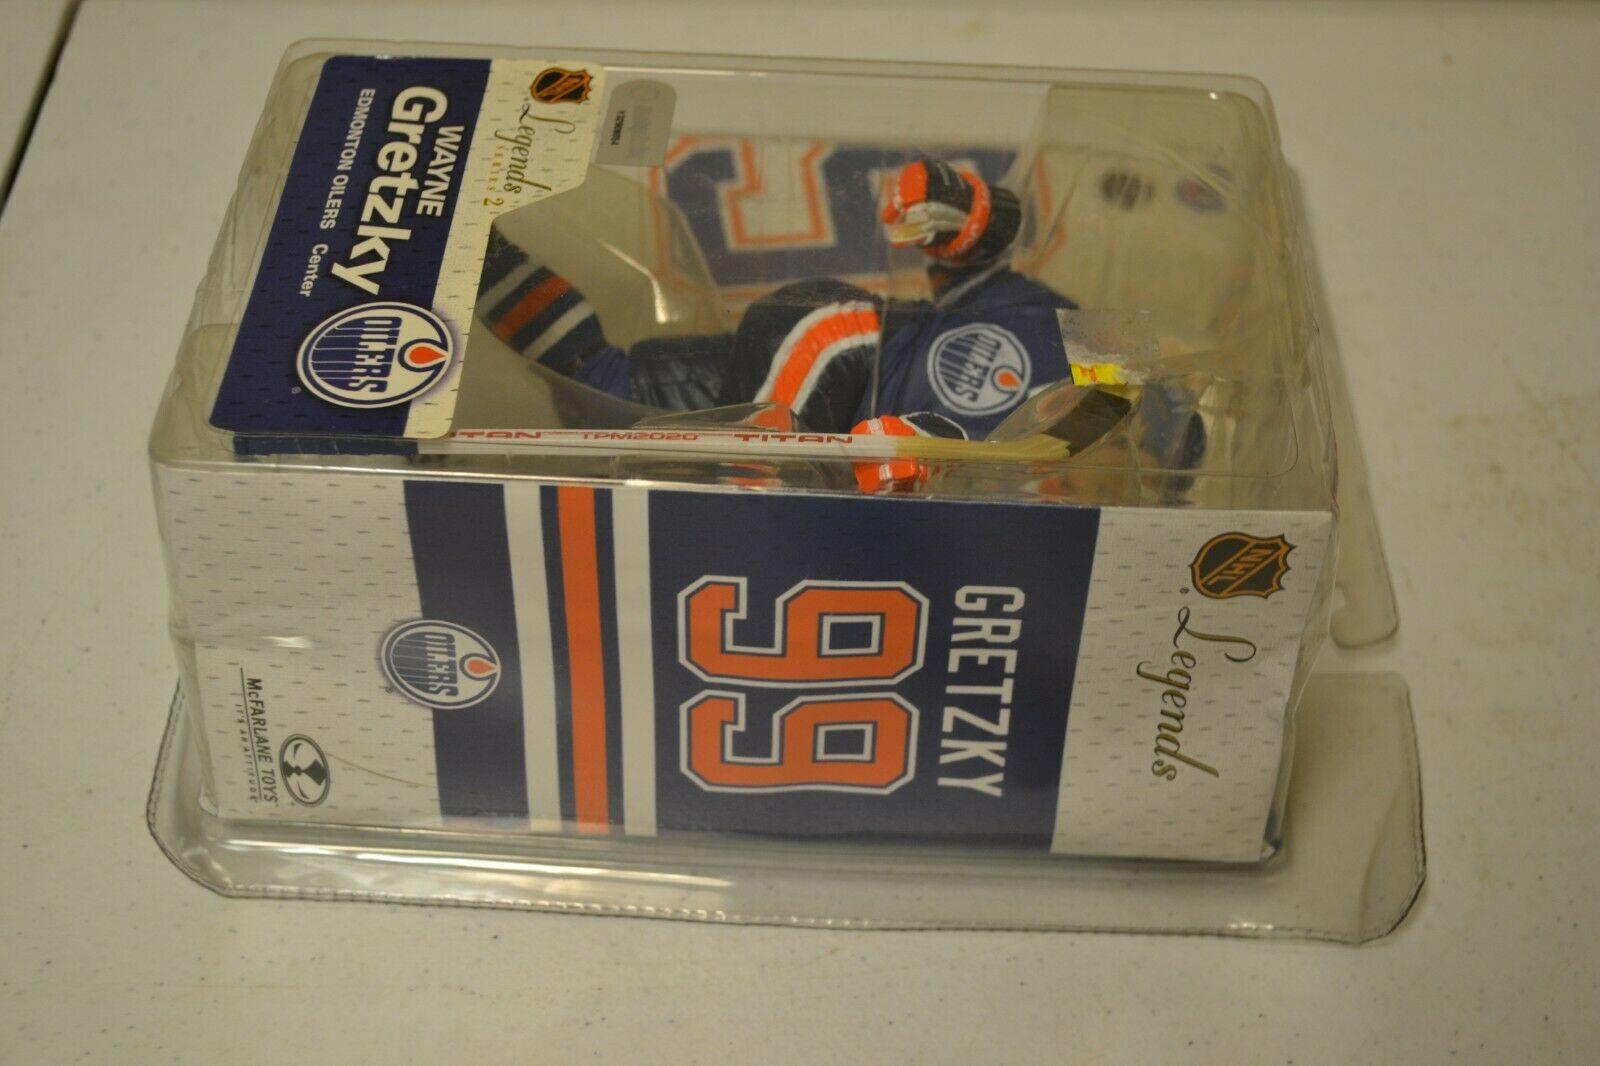 2005 McFarlane NHL Legends Series 2 Wayne Gretzky #99 Edmonton Oilers Figure image 3